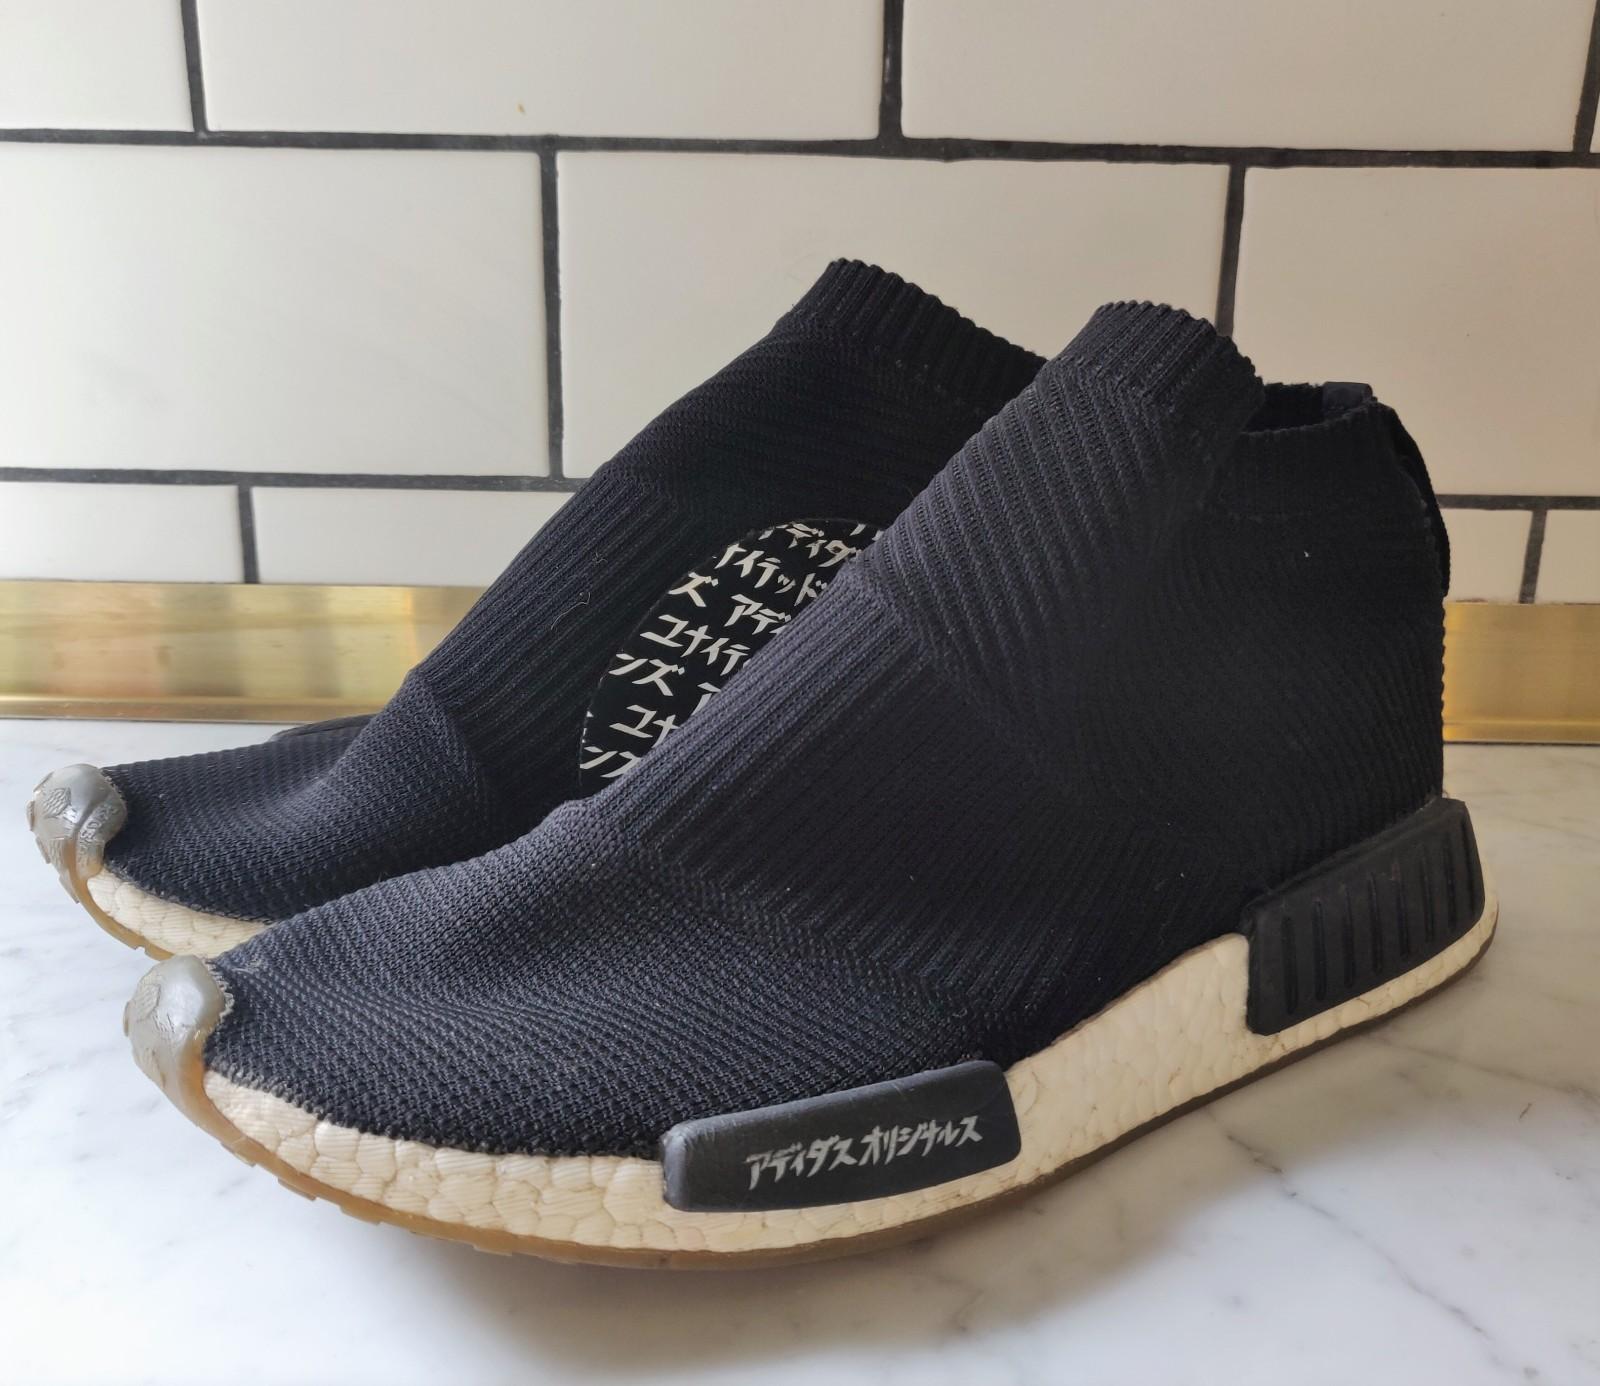 reputable site bc143 24050 Adidas NMD CS United Arrows Mikitype - Sneakershyllan GBG AB